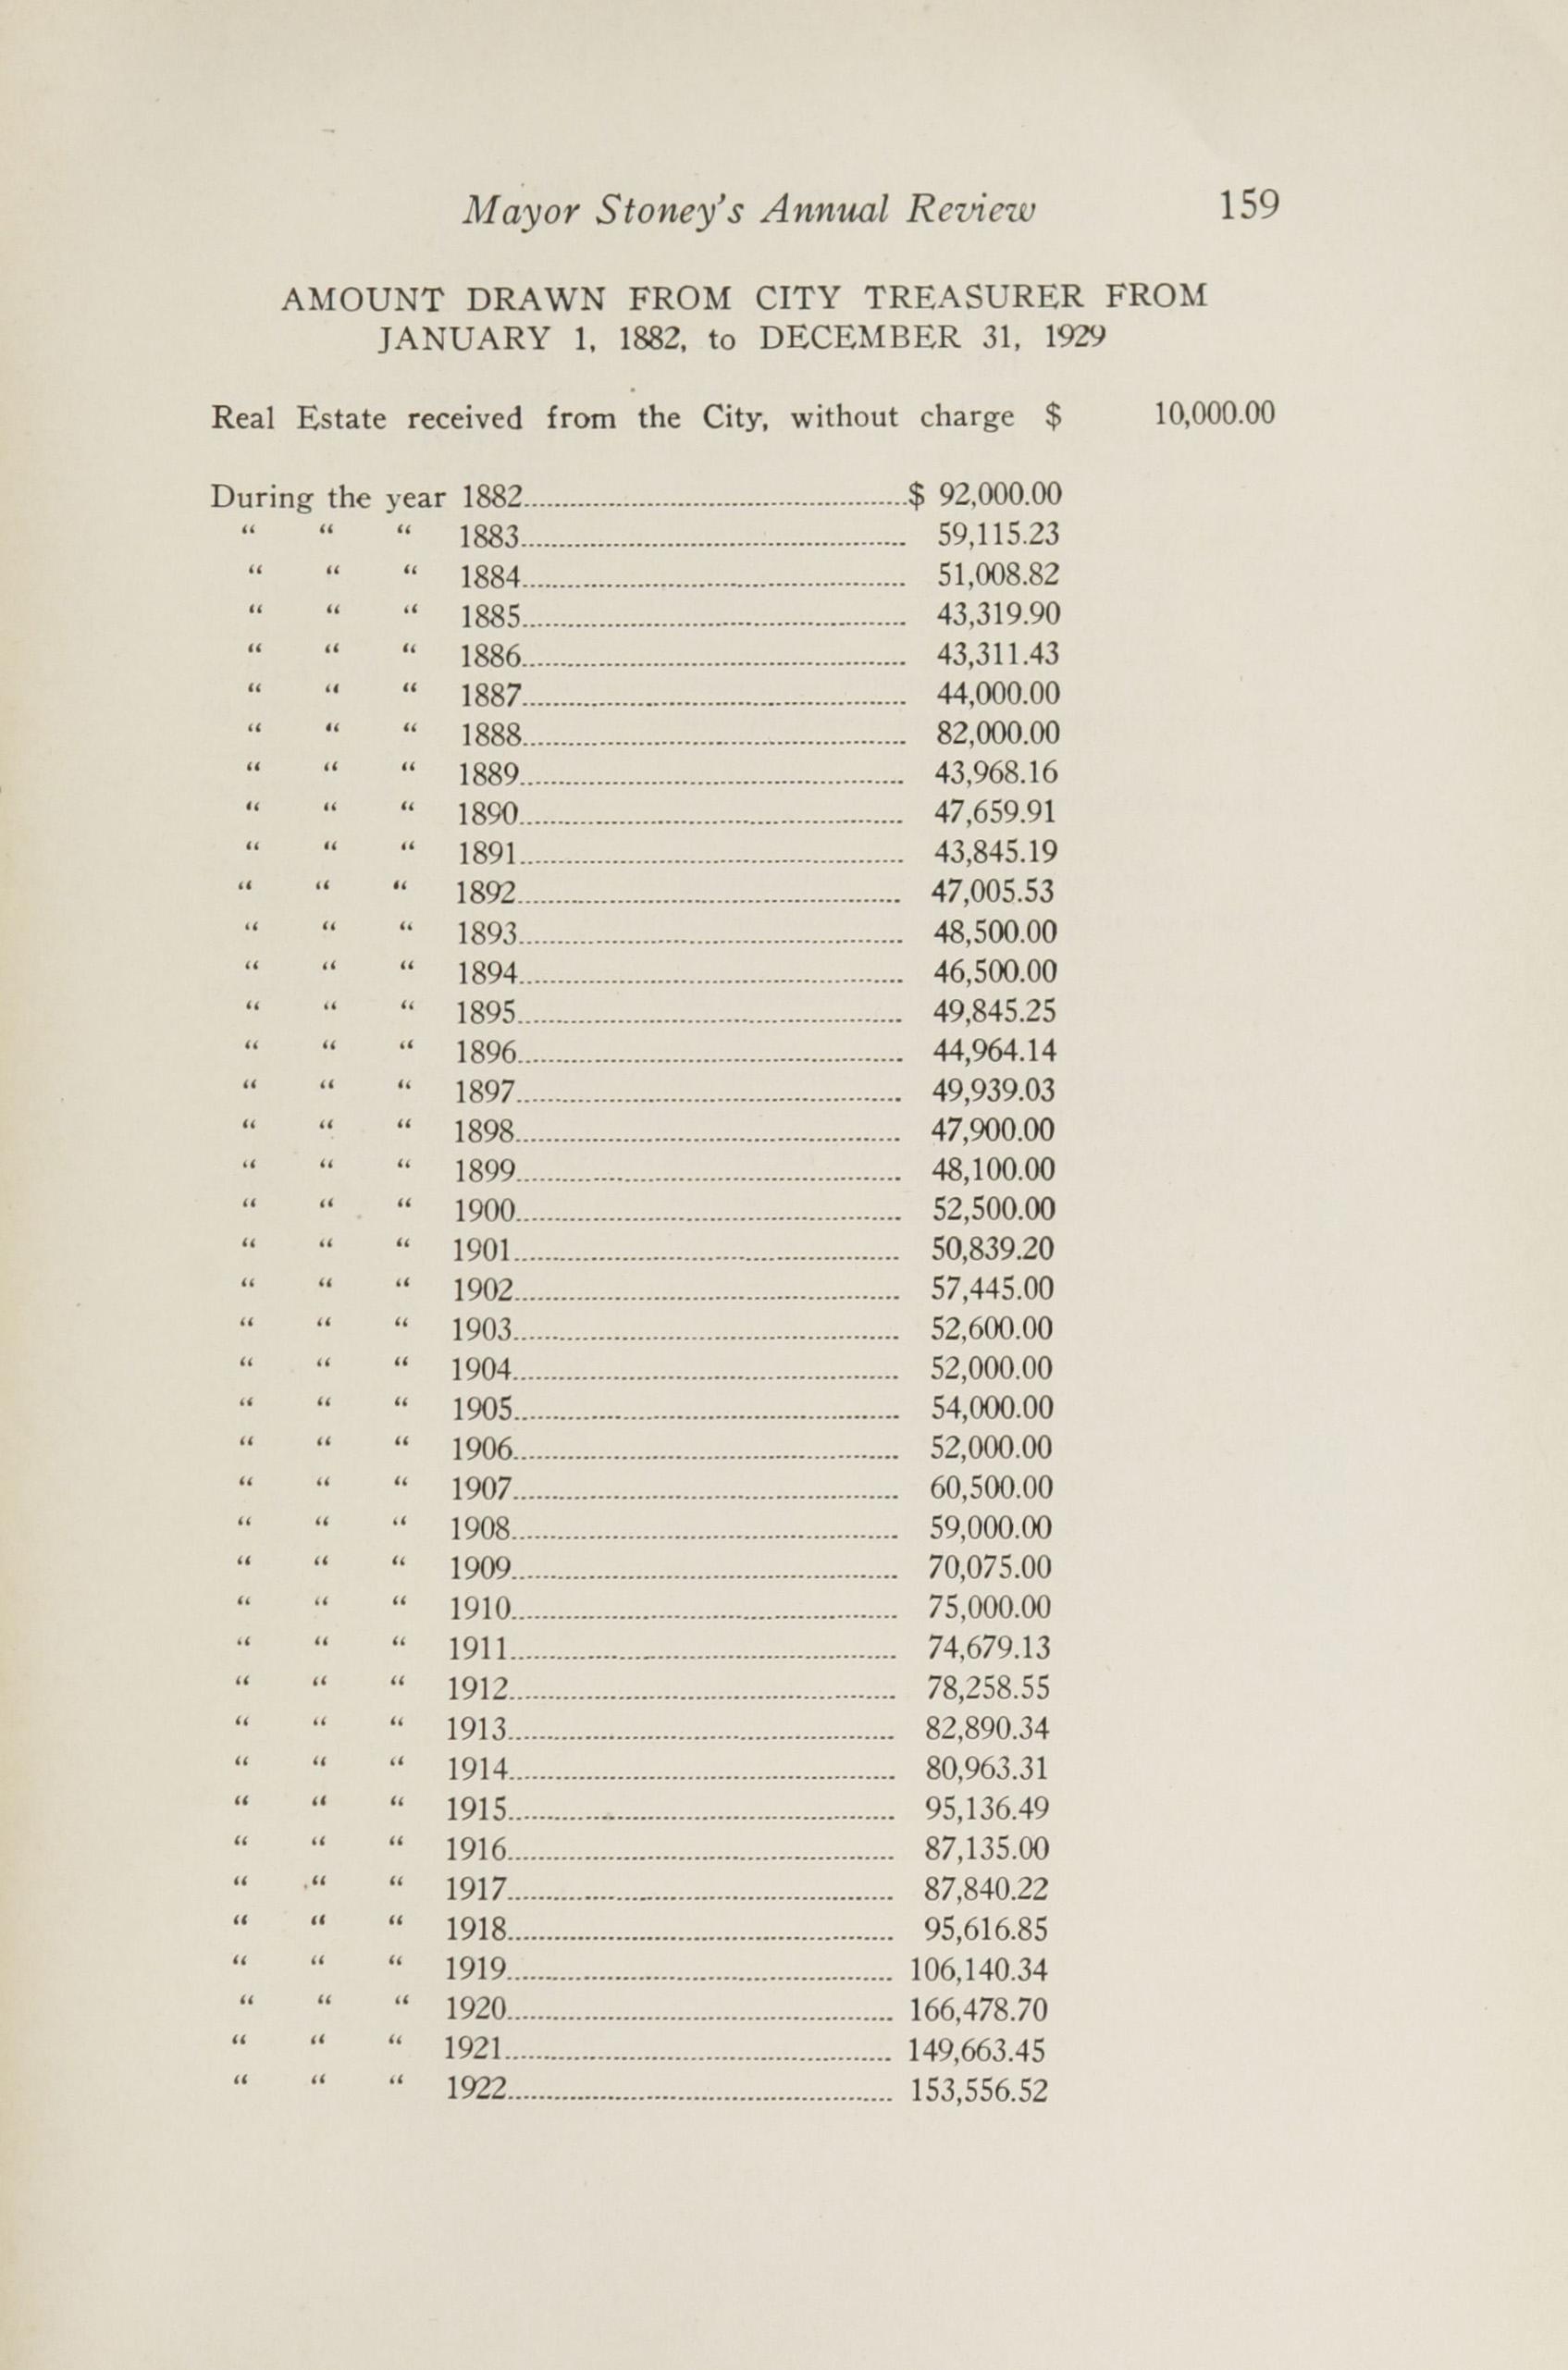 Charleston Yearbook, 1929, page 159